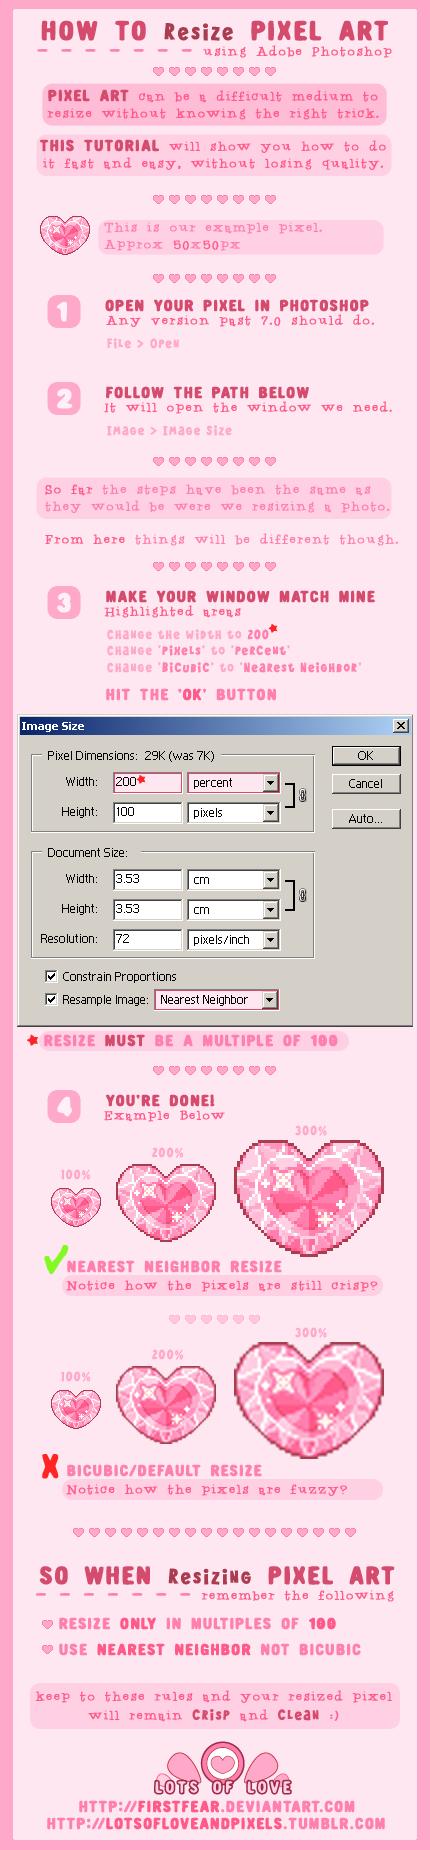 Drawn pixel art pixel icon Pixel deviantART deviantART Tutorial on